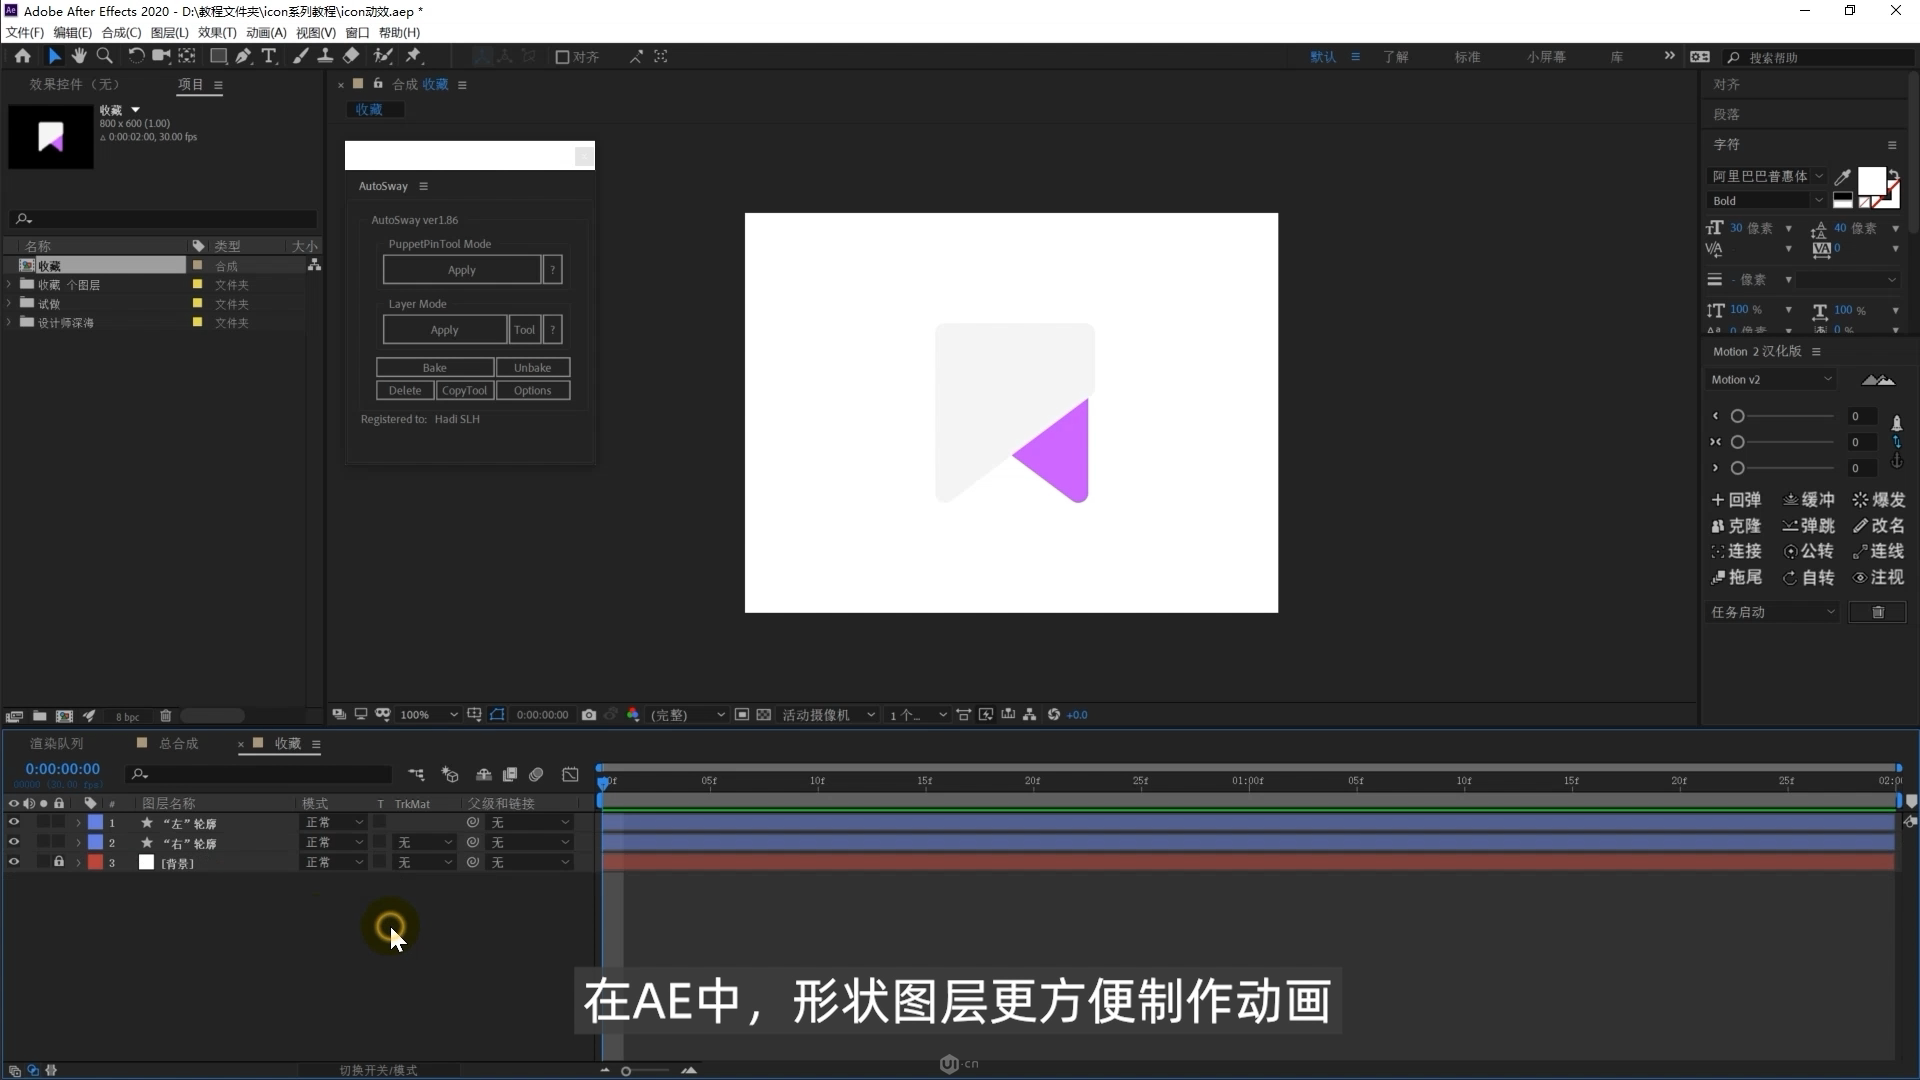 AE制作毛玻璃风格图标动效(5)